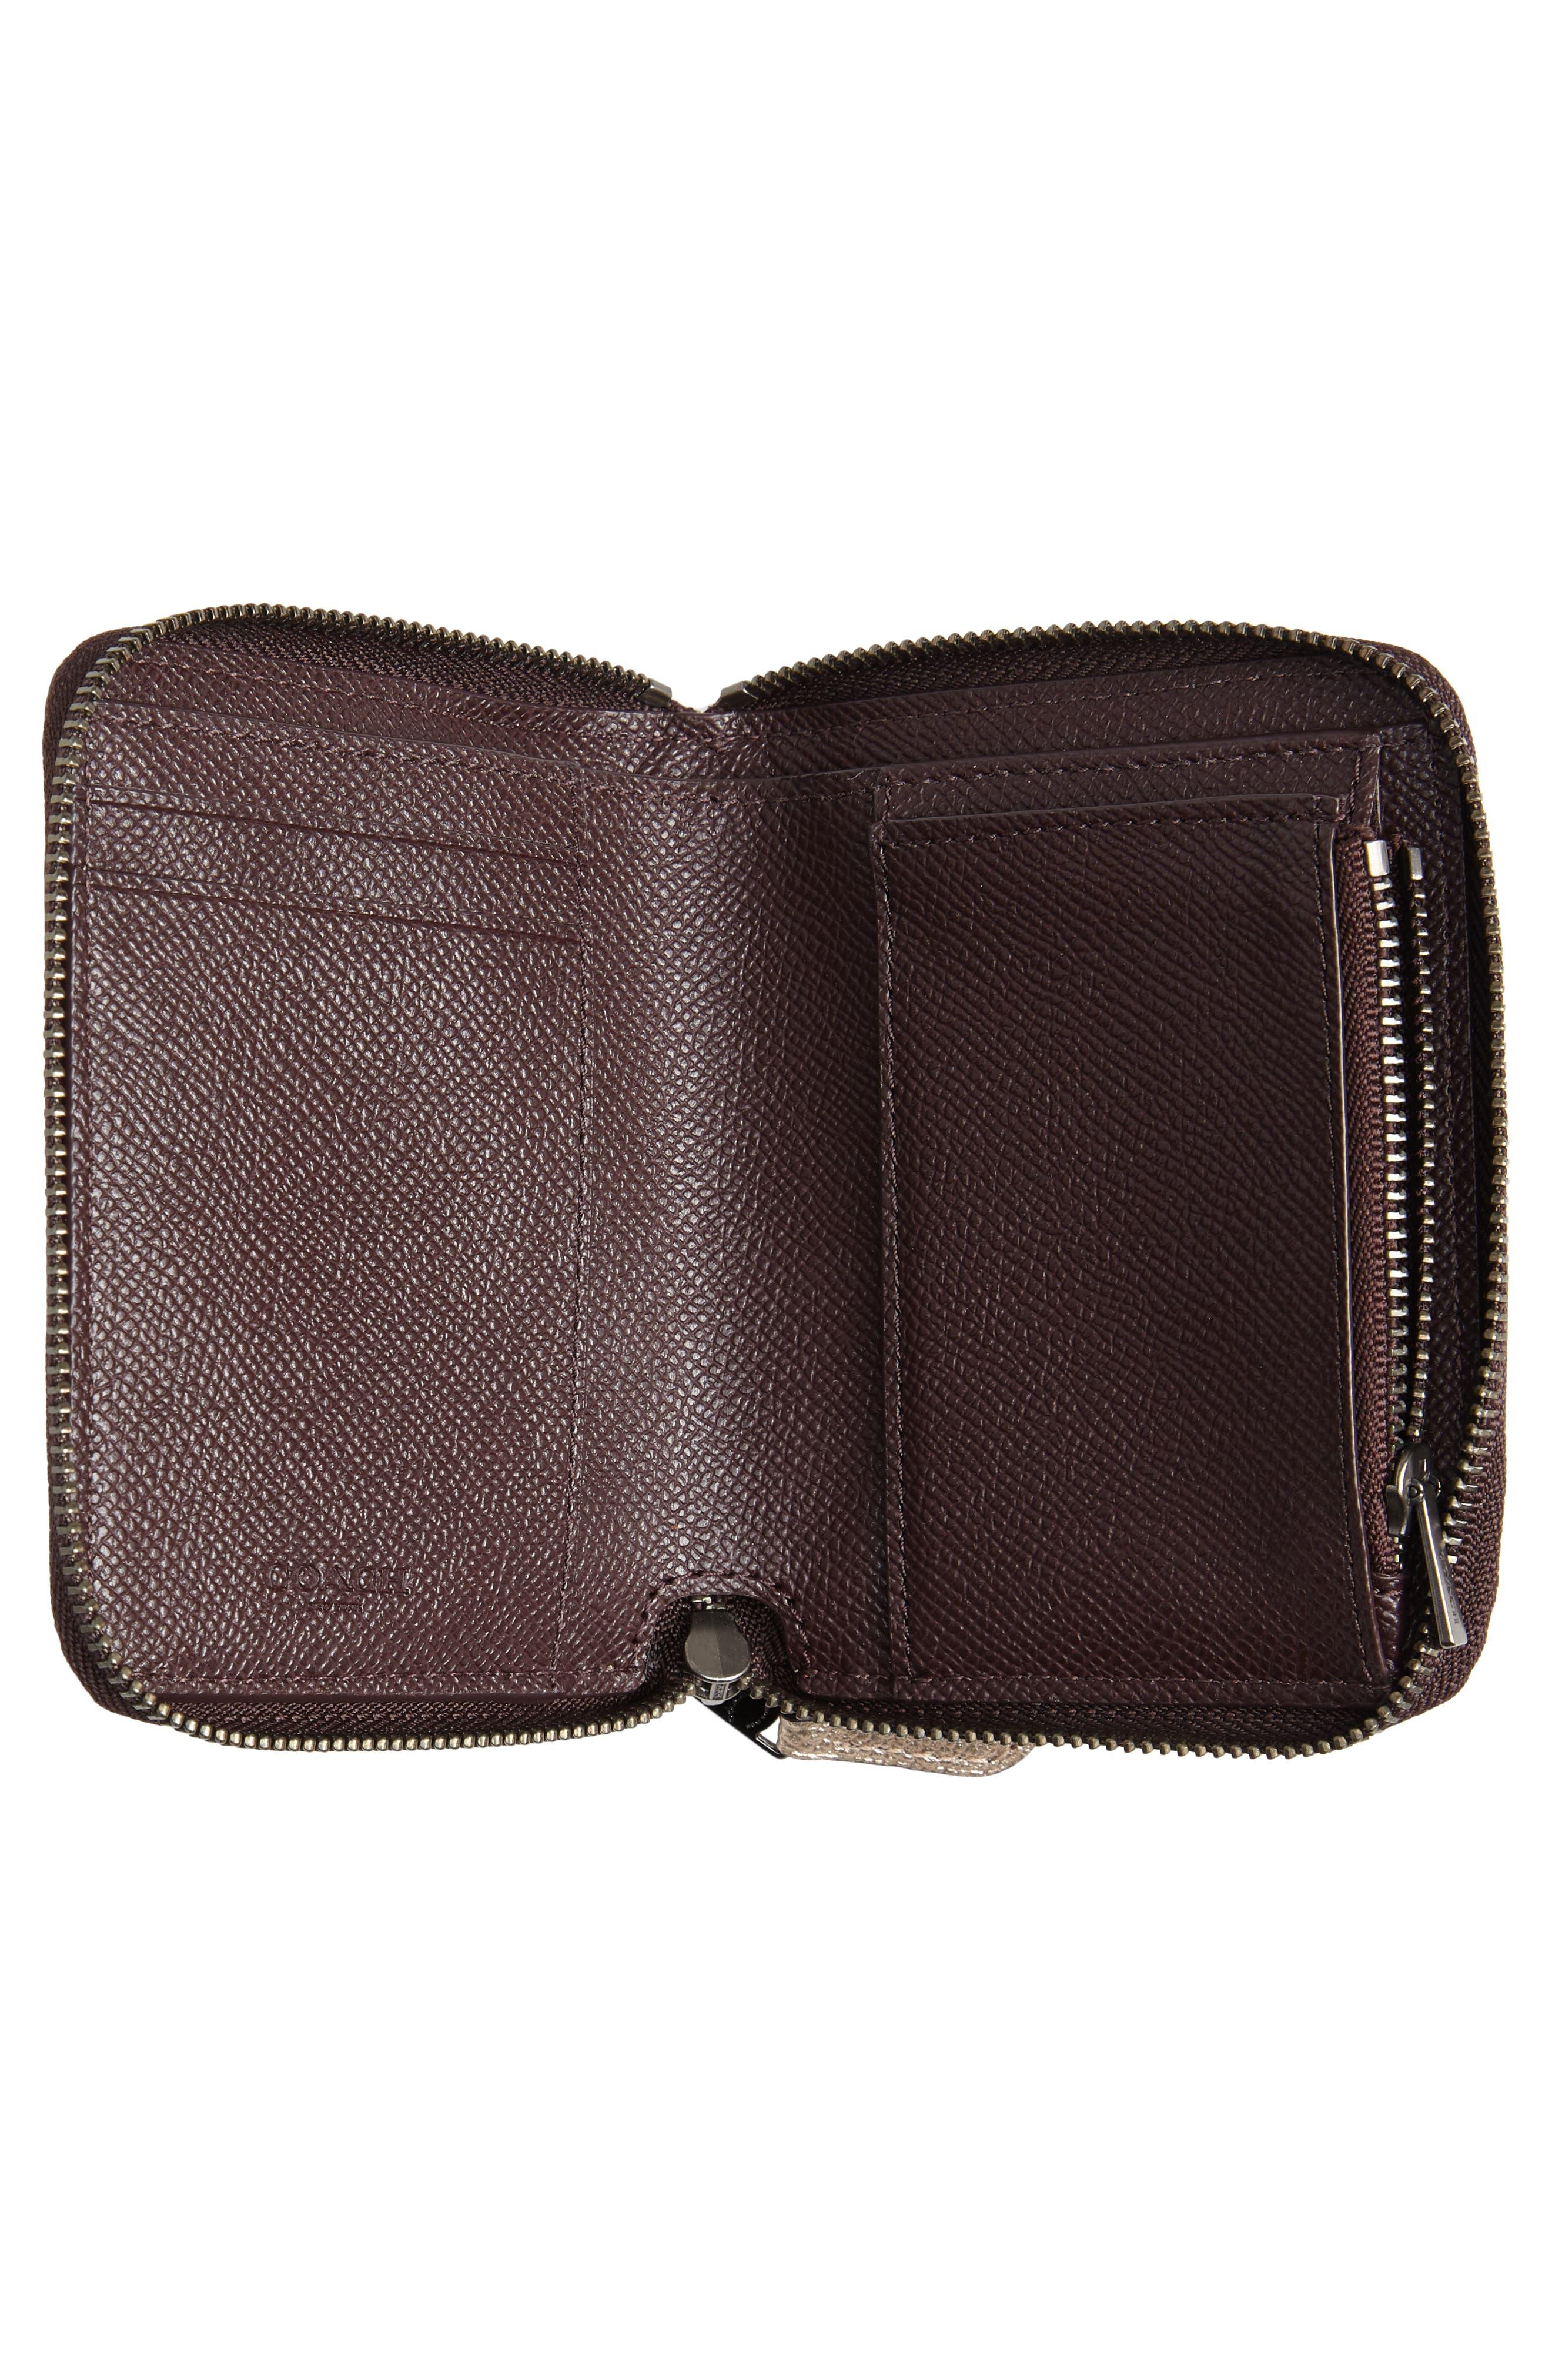 COACH,                             Small Metallic Leather Zip Around Wallet,                             Alternate thumbnail 2, color,                             PLATINUM